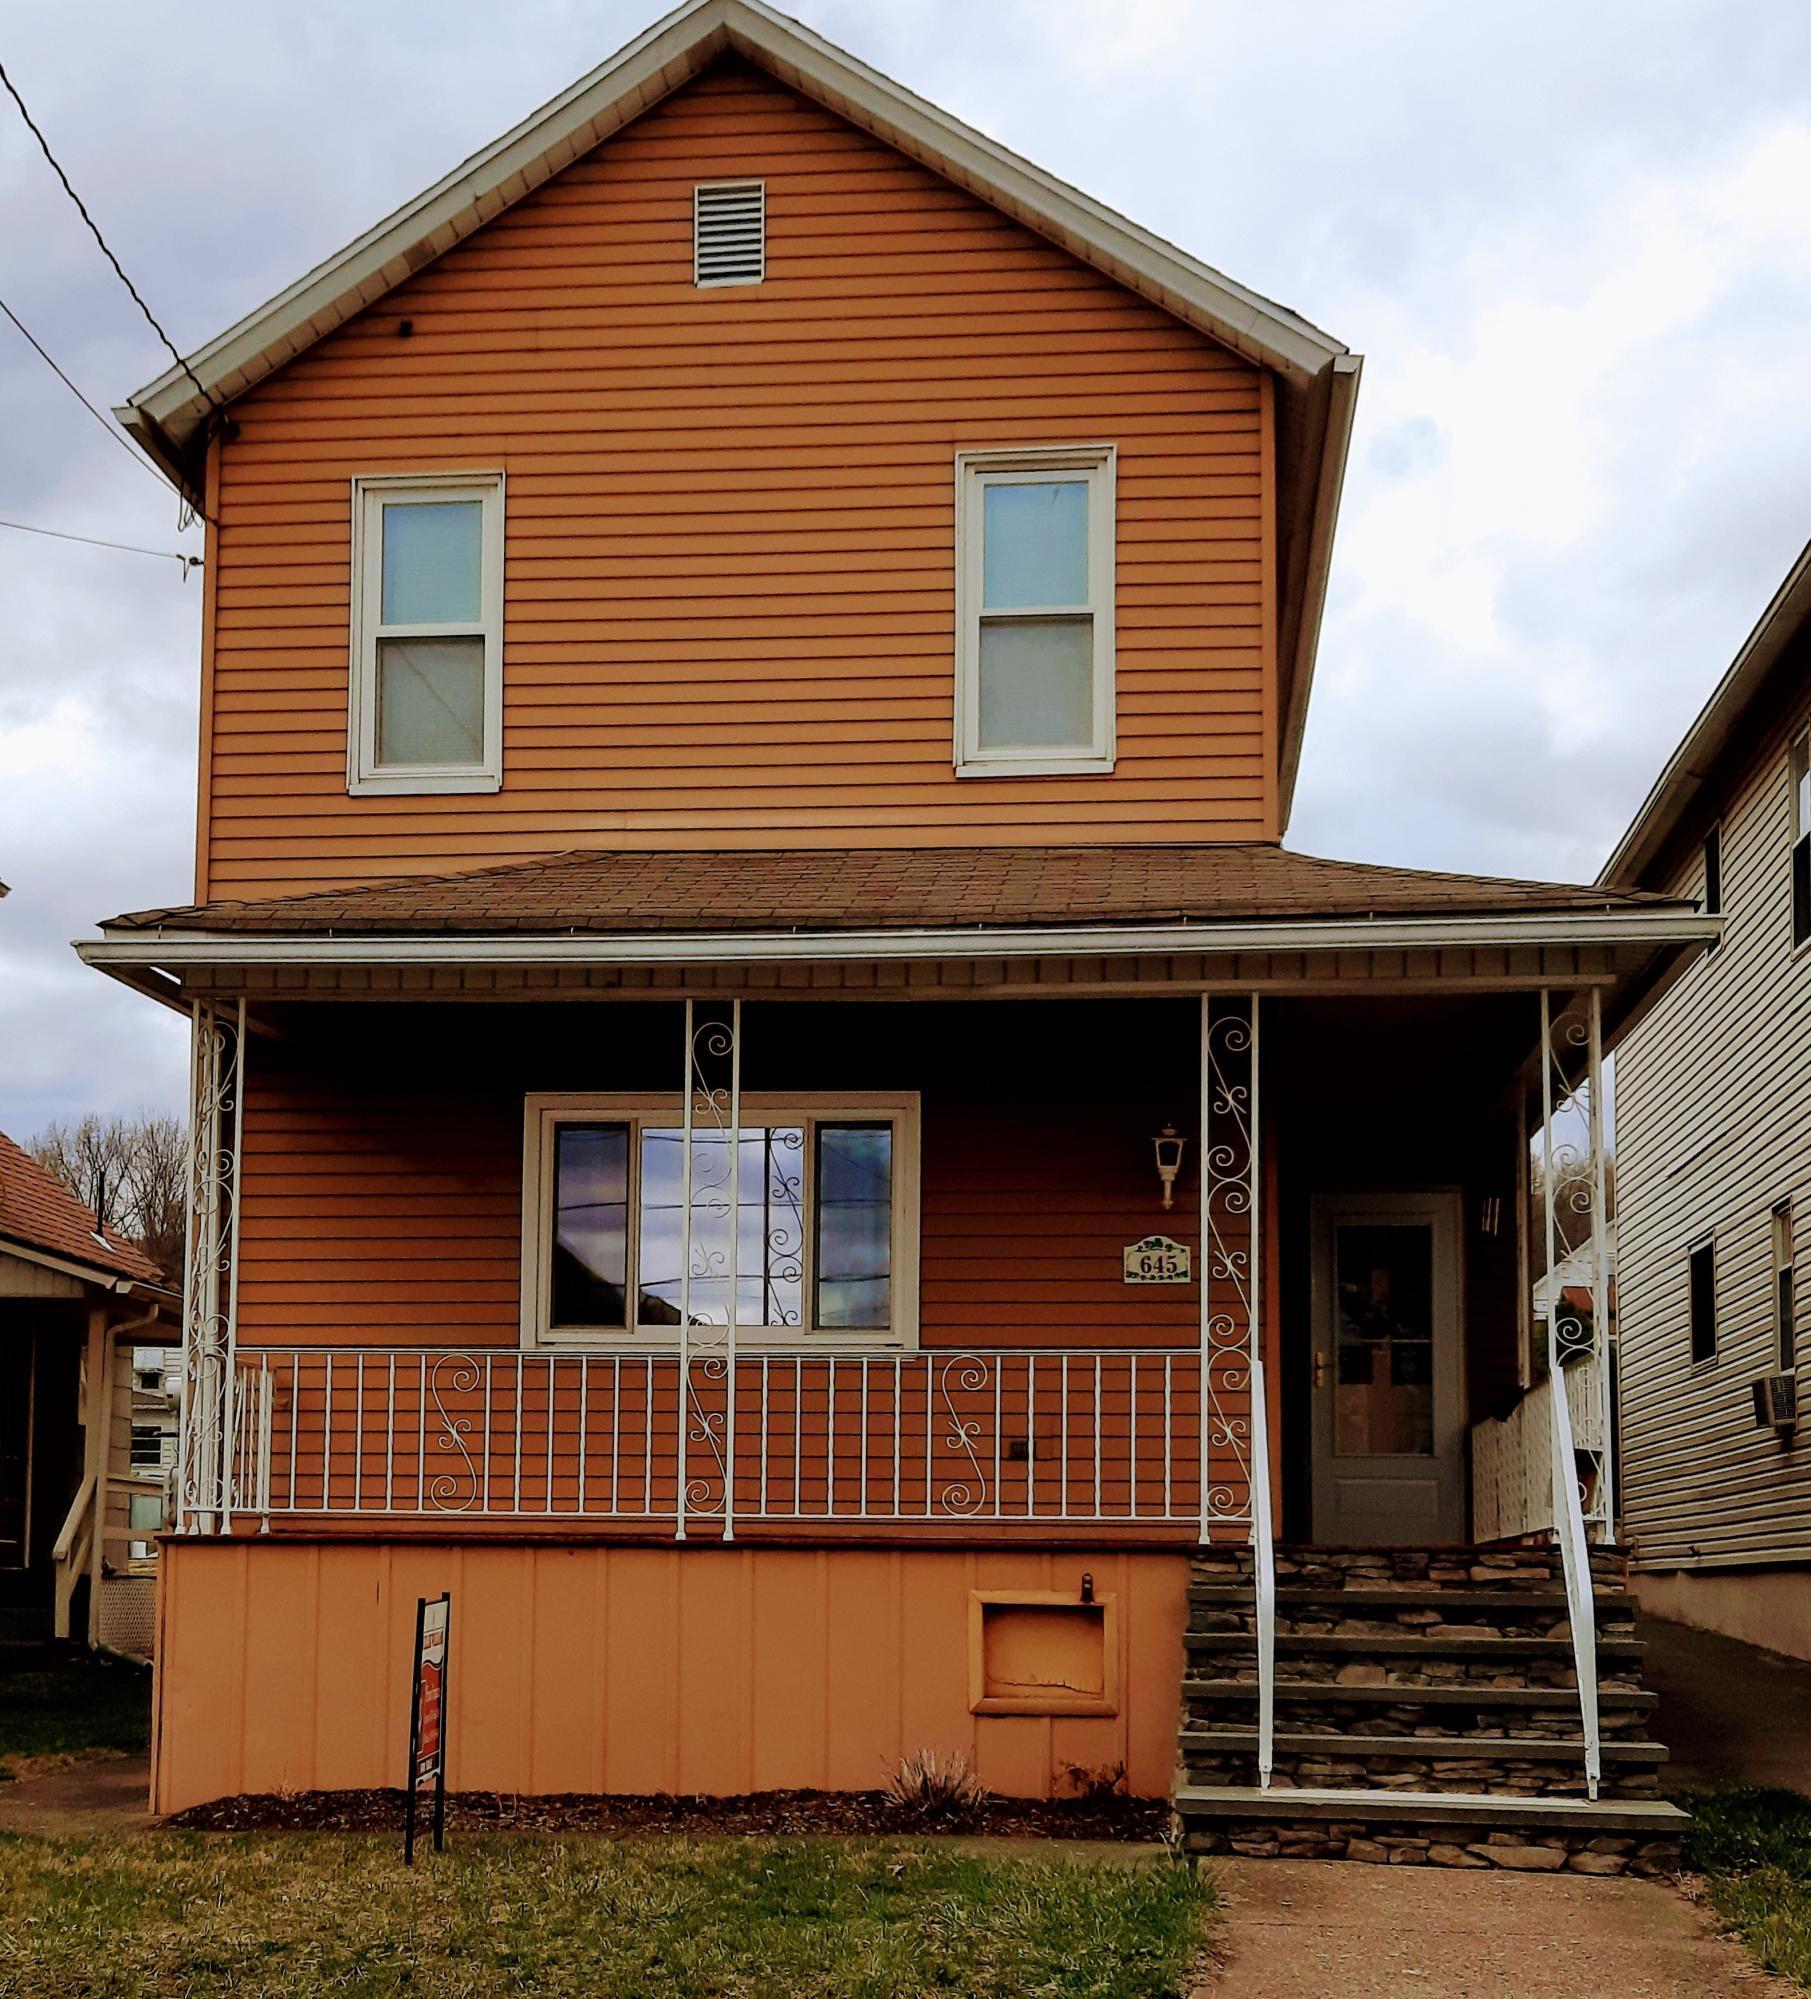 645 Carmalt St, Dickson City, Pennsylvania 18519, 3 Bedrooms Bedrooms, 6 Rooms Rooms,1 BathroomBathrooms,Single Family,For Sale,Carmalt,21-558